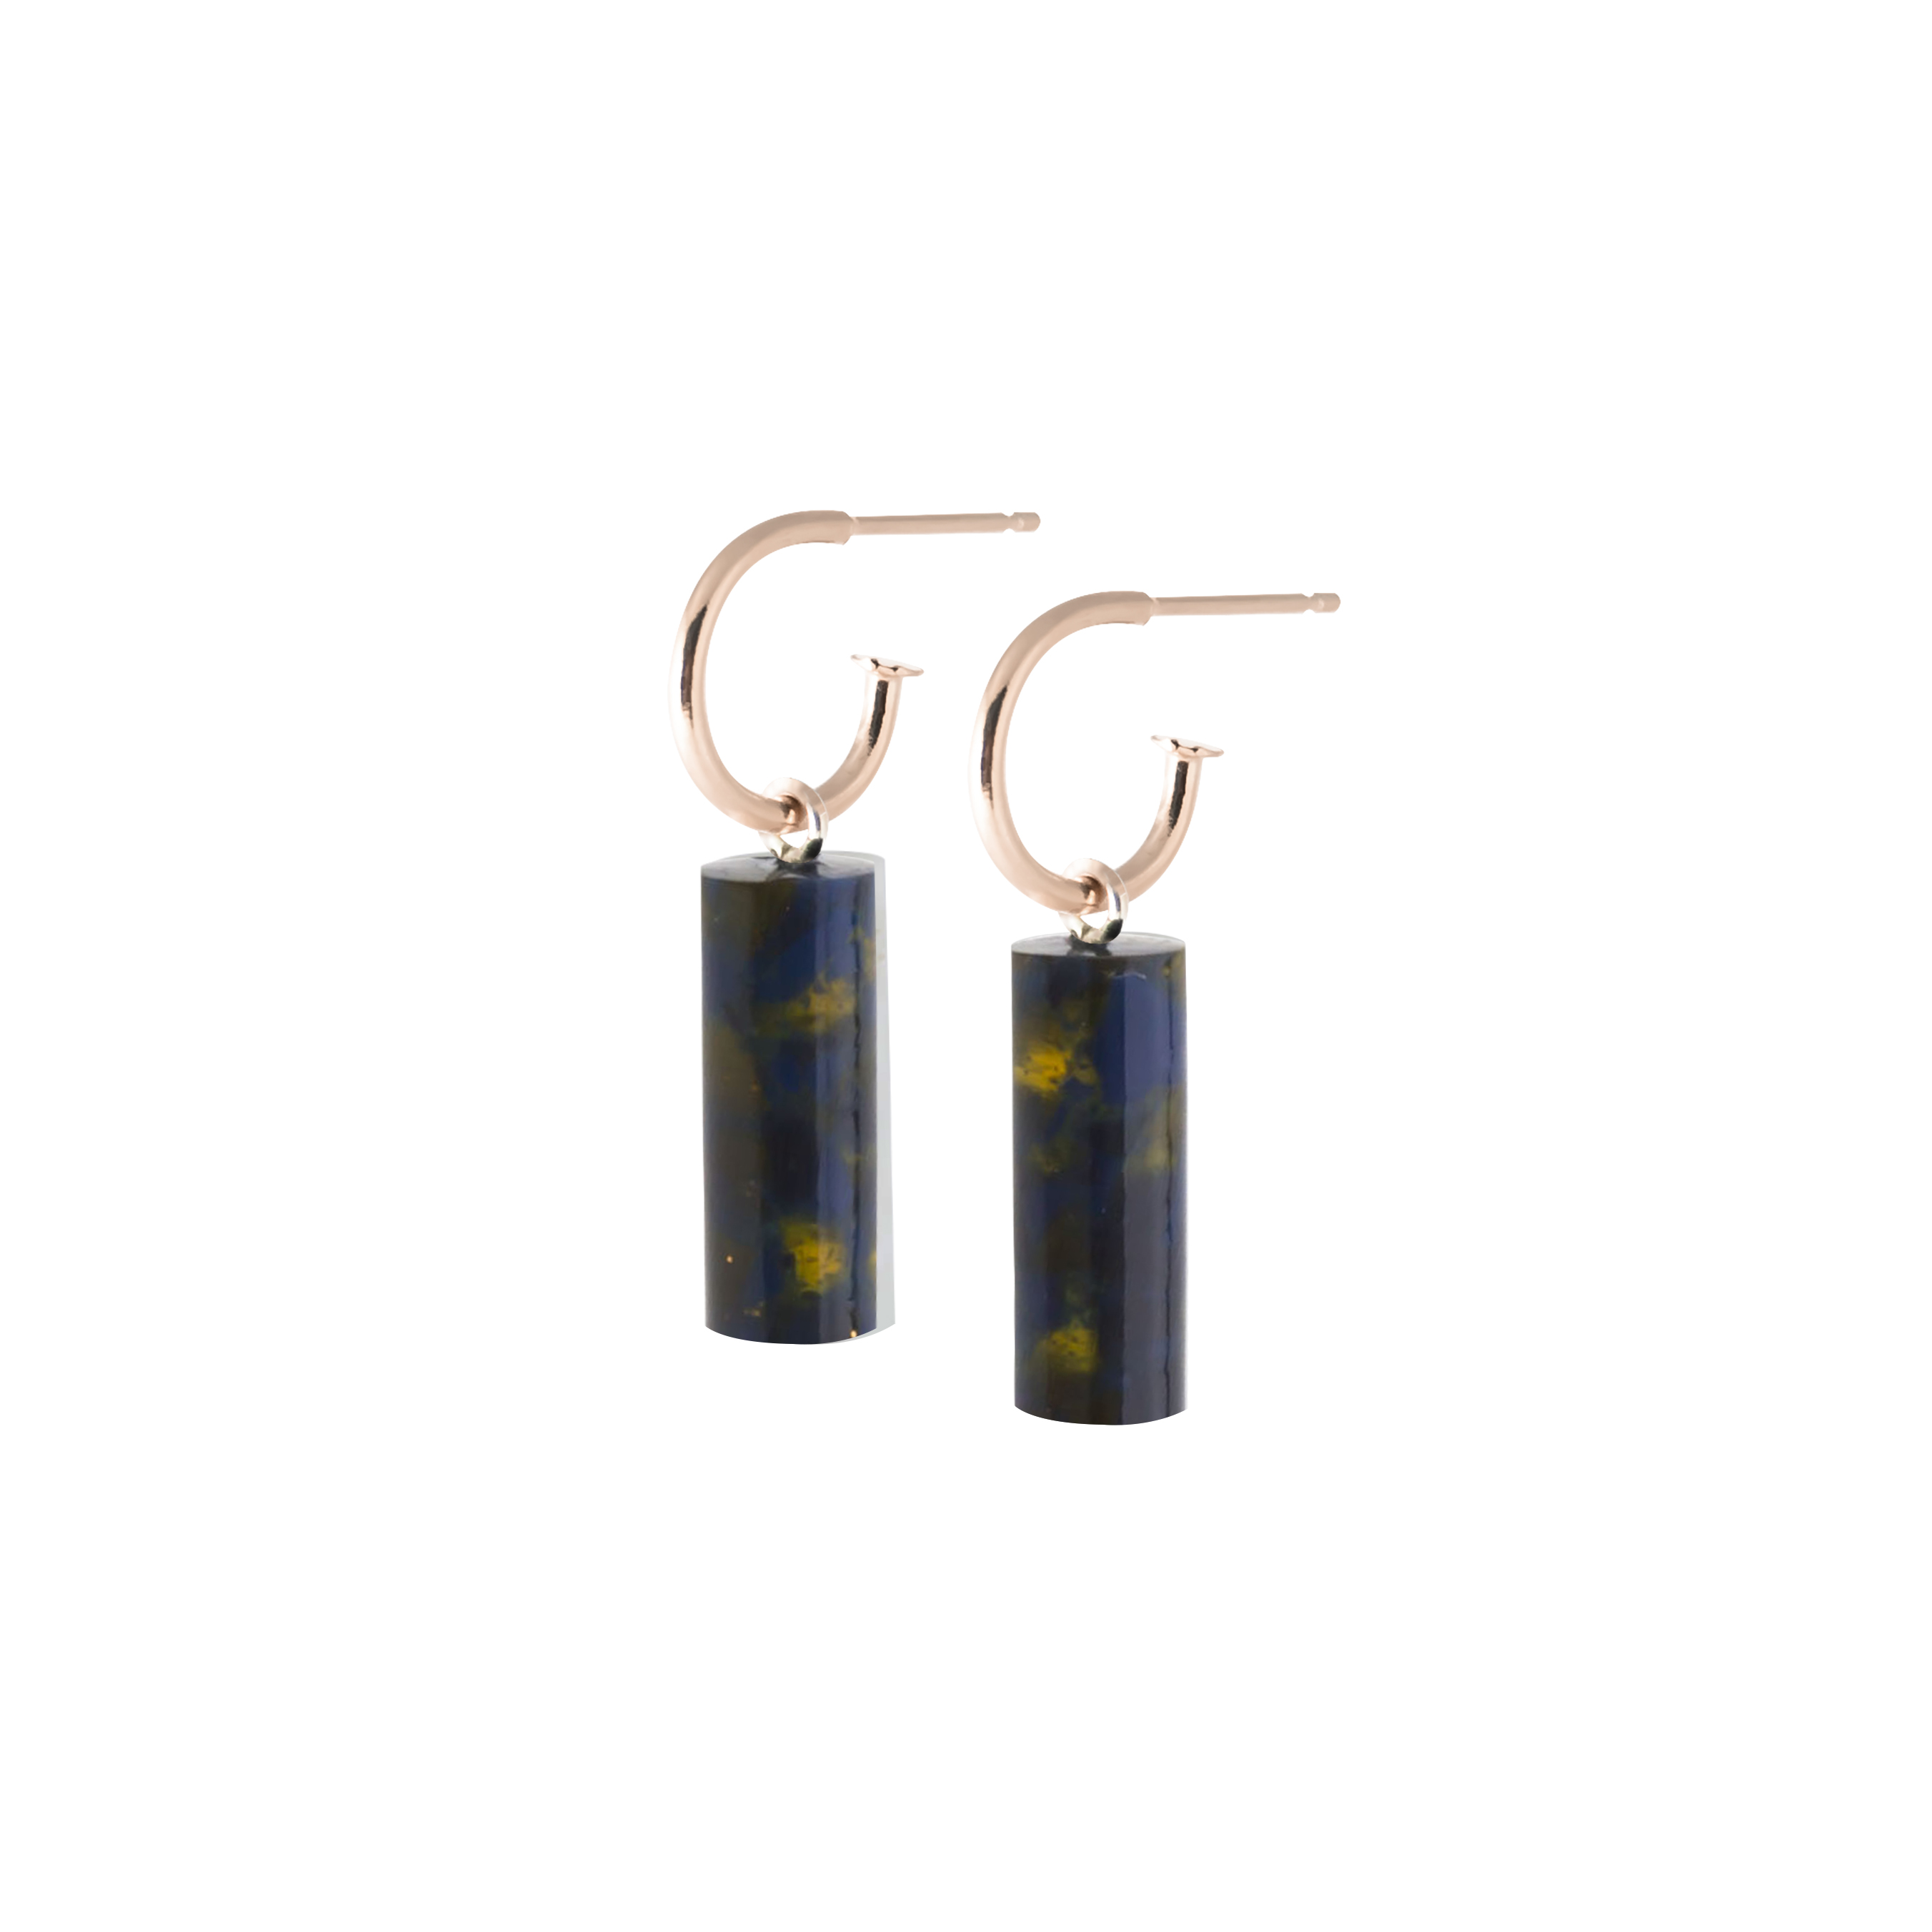 oorbel staaf kort-blackishyellow-roos